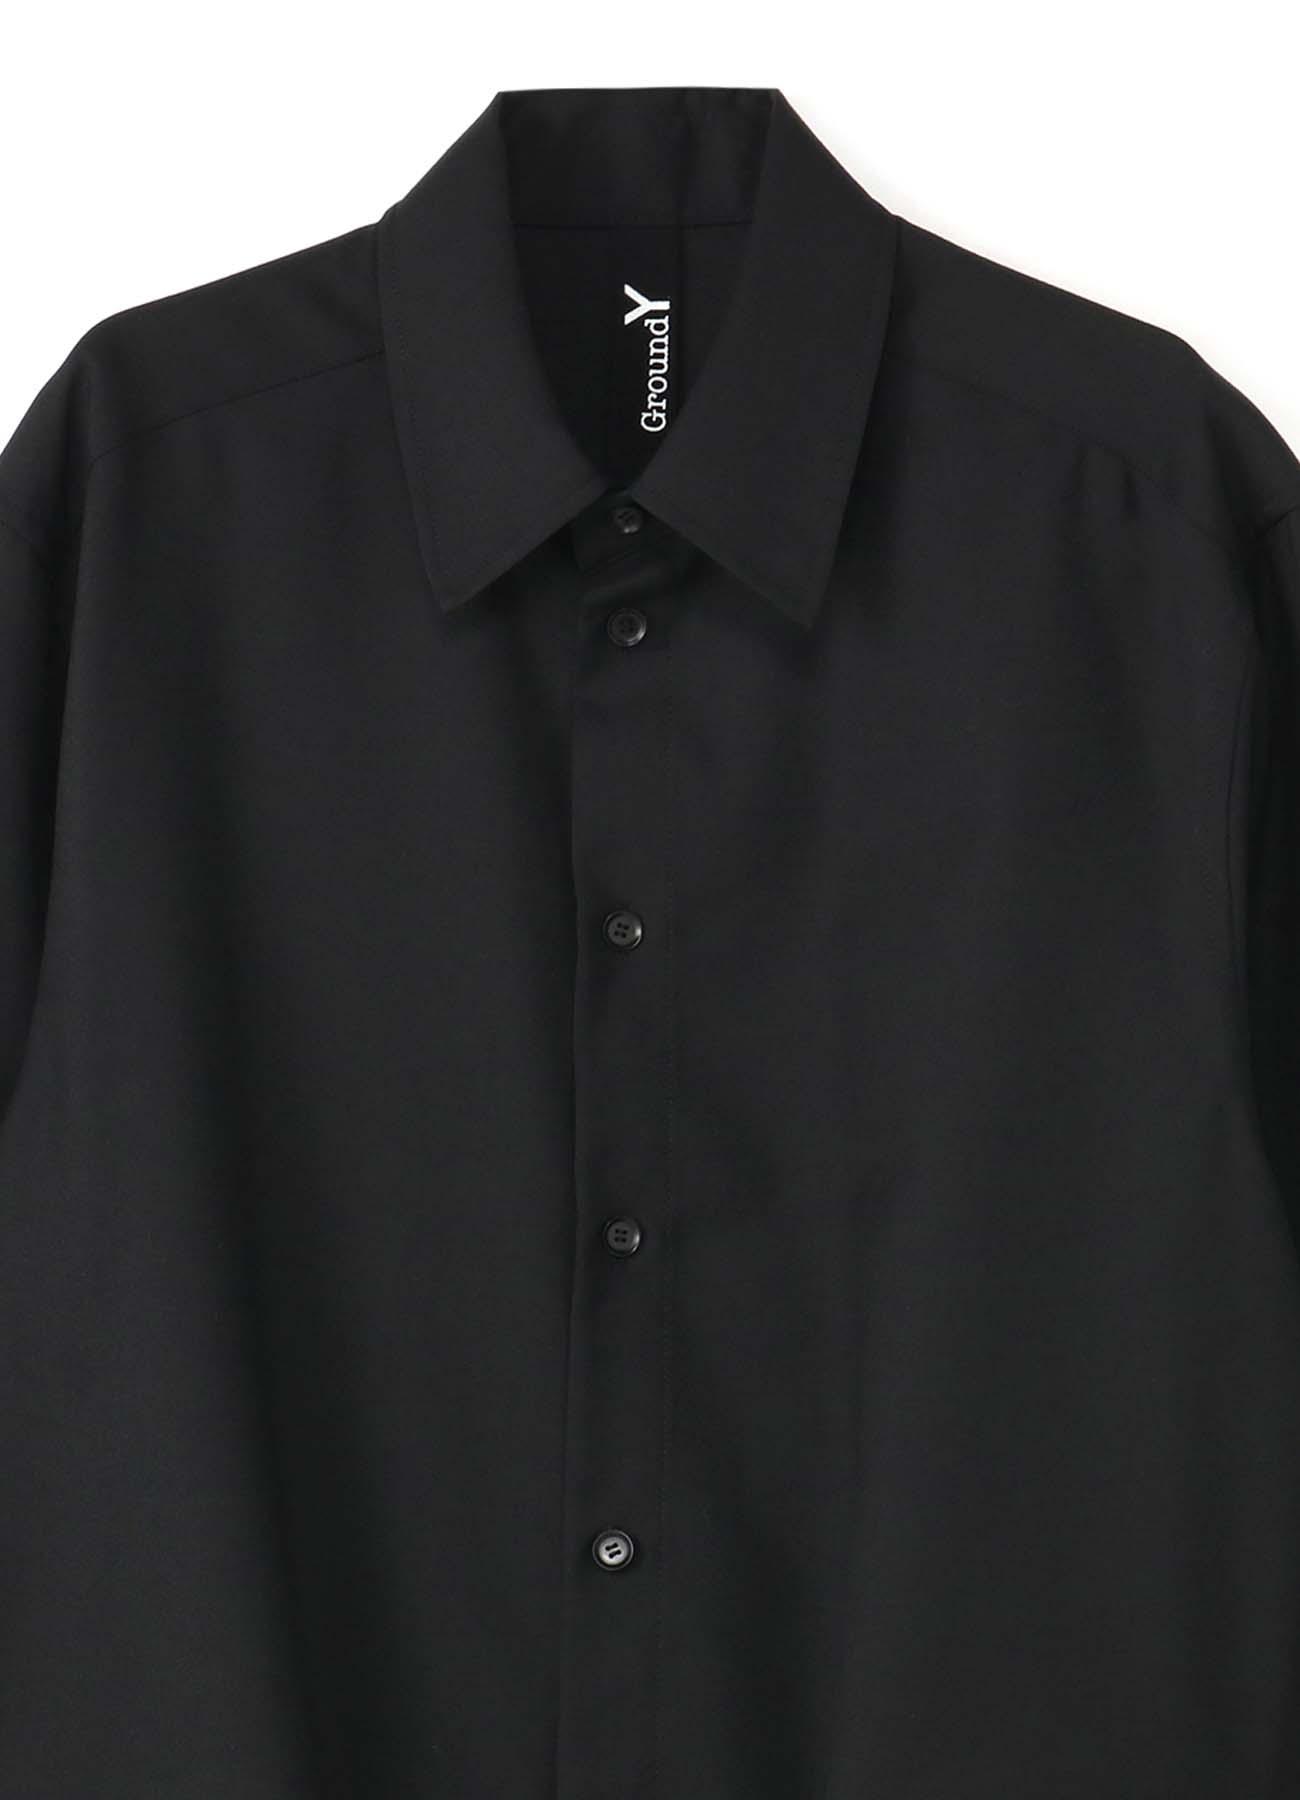 T/W Gabardine Gather Drape Shirt